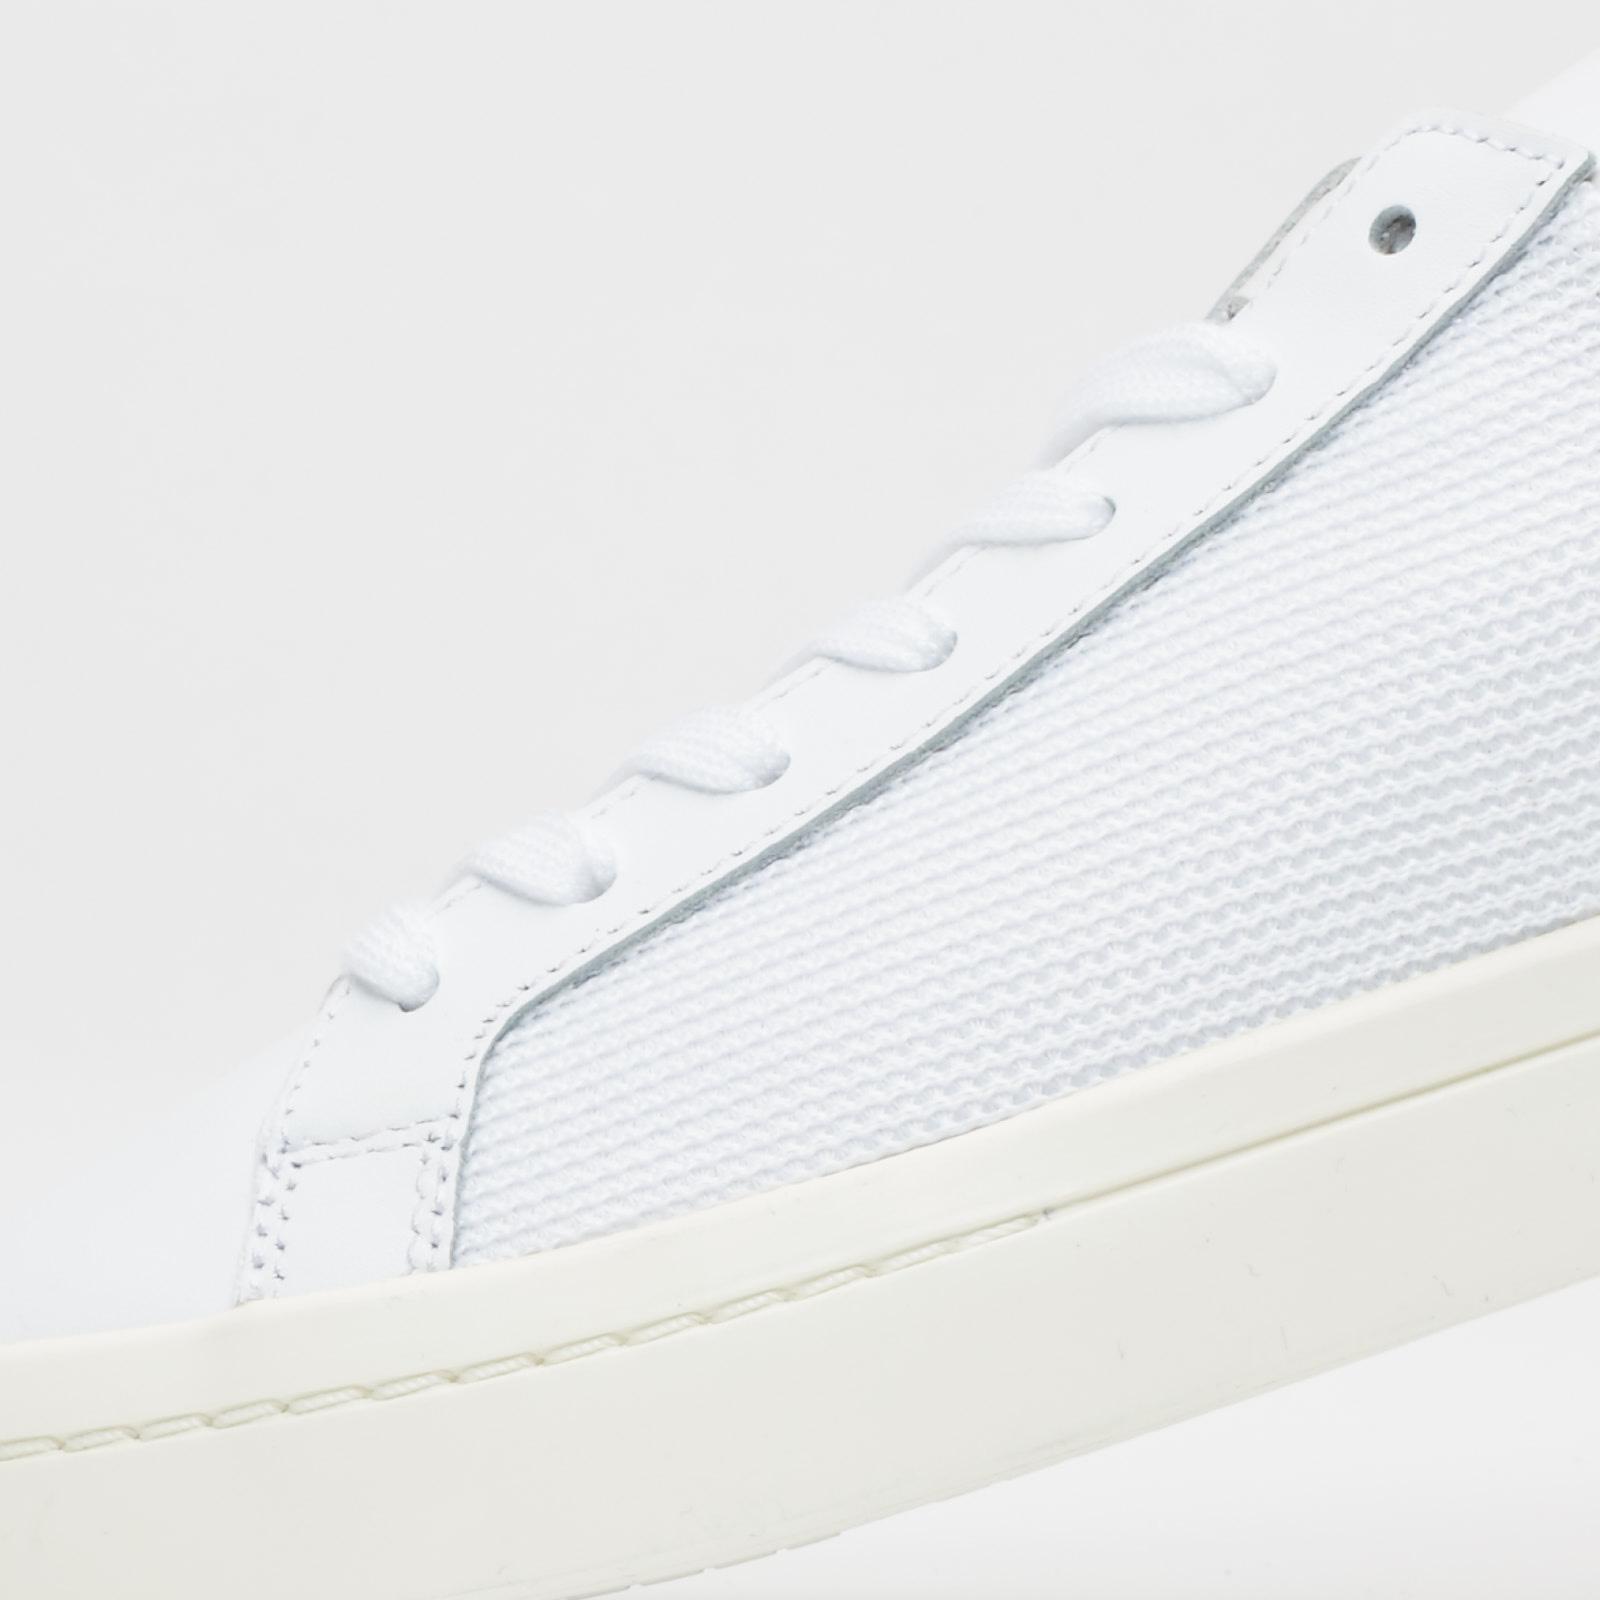 new arrival 77b50 c556a ... Originals Courtvantage W Ftwr White Ash Pearl S18 i5p1j3Dw  66b1e6461a760 adidas Courtvantage W - Cq2614 - Sneakersnstuff sneakers ..  ...